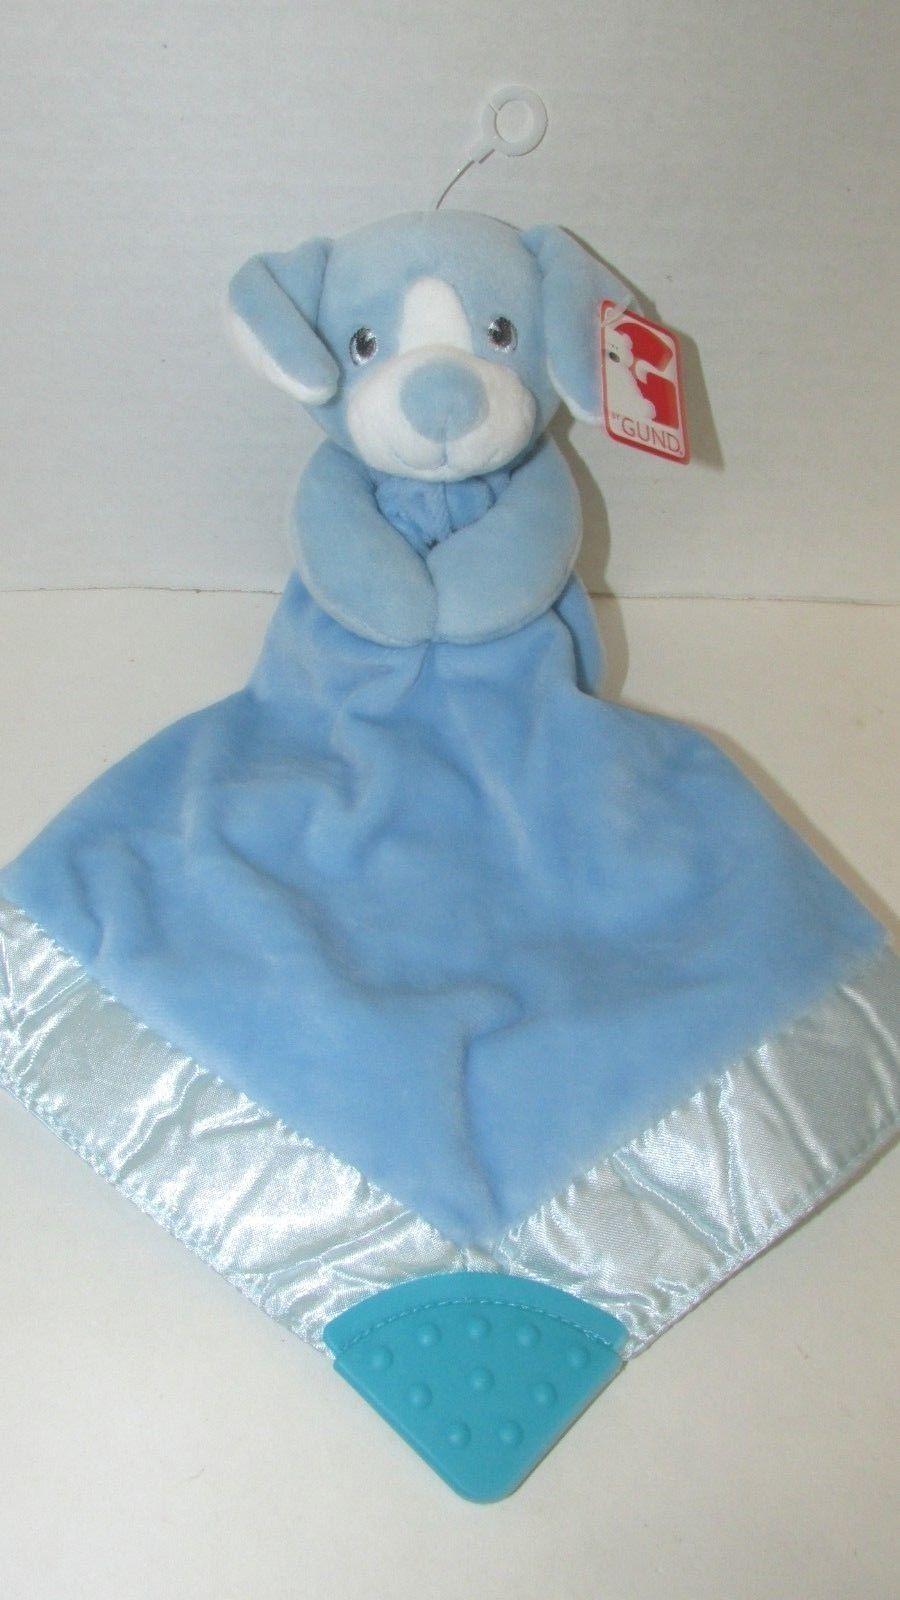 NWT Gund Blue Puppy Security Blanket Teether Velour Satin Lovey Toy 4061586